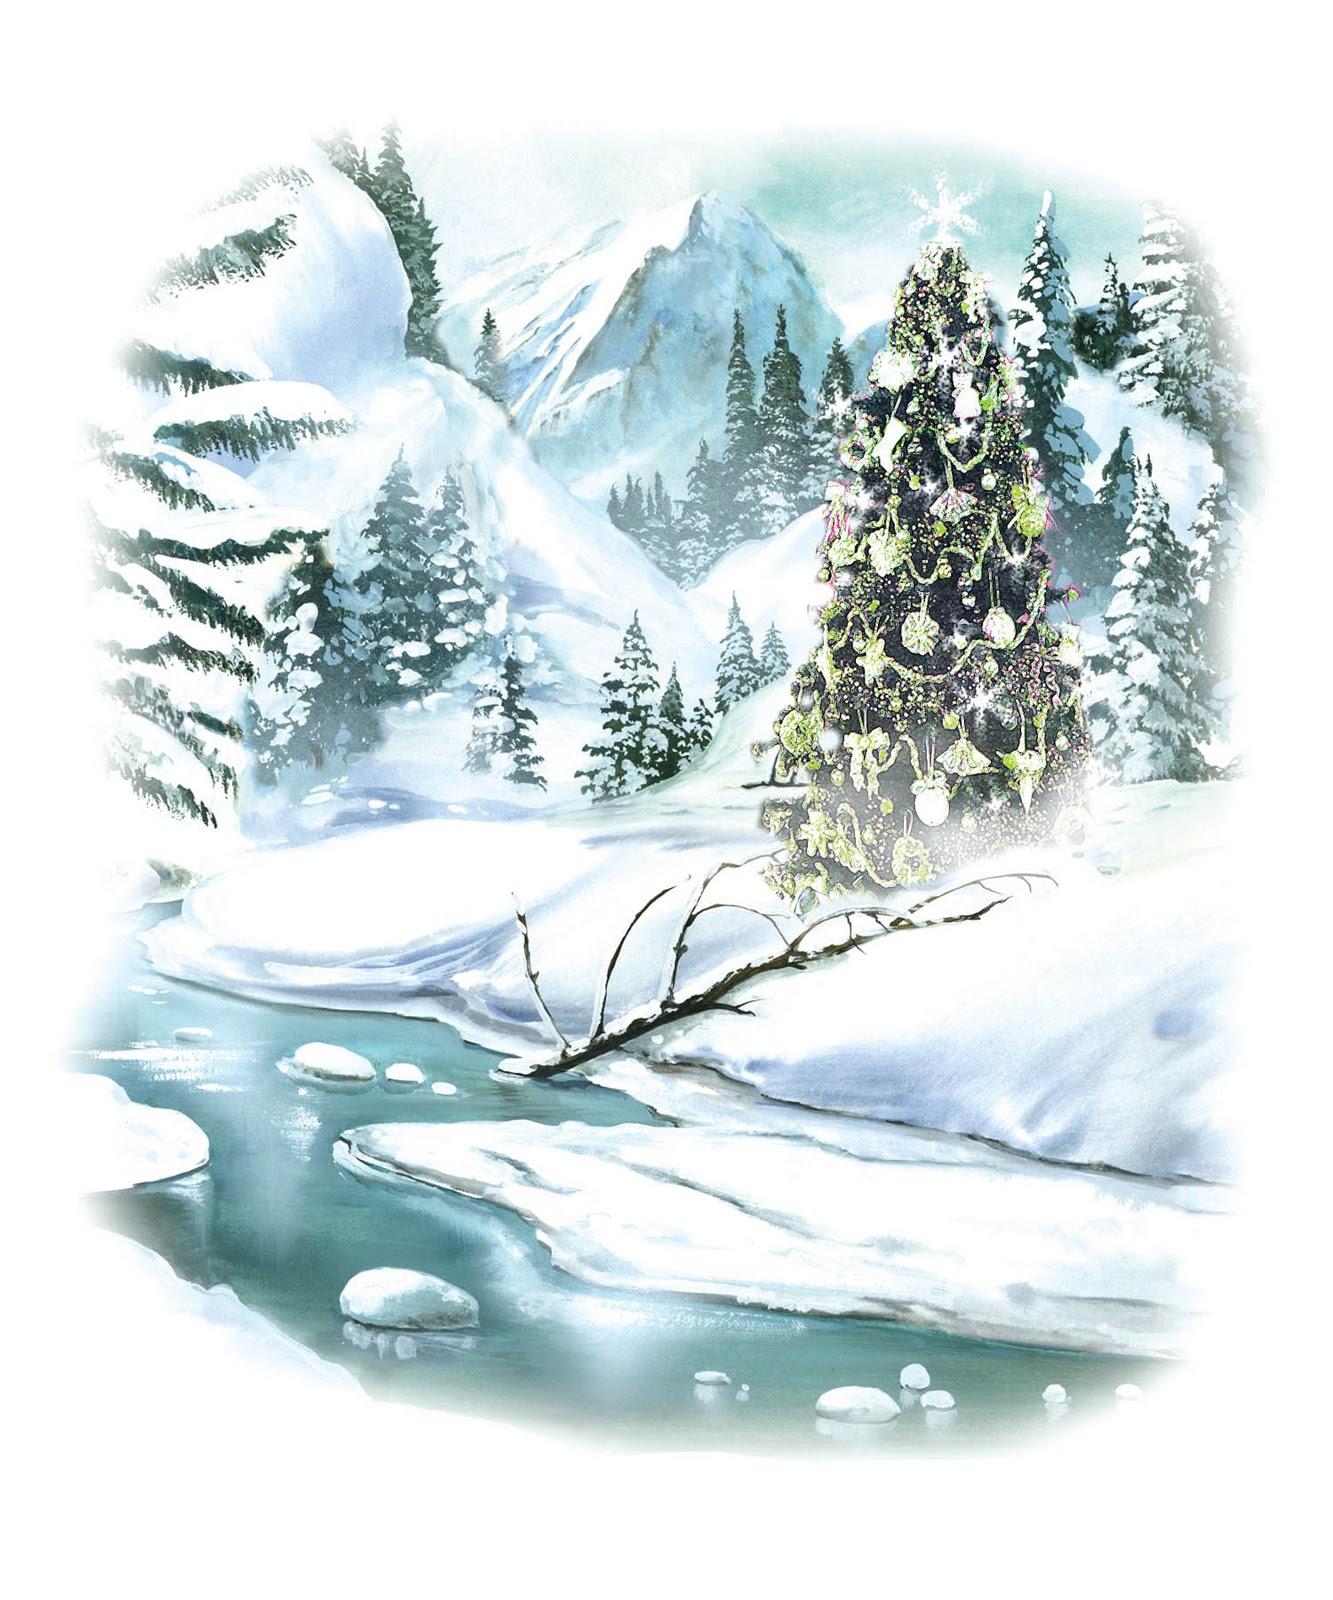 Tree free holiday graphics. Beautiful clipart christmas